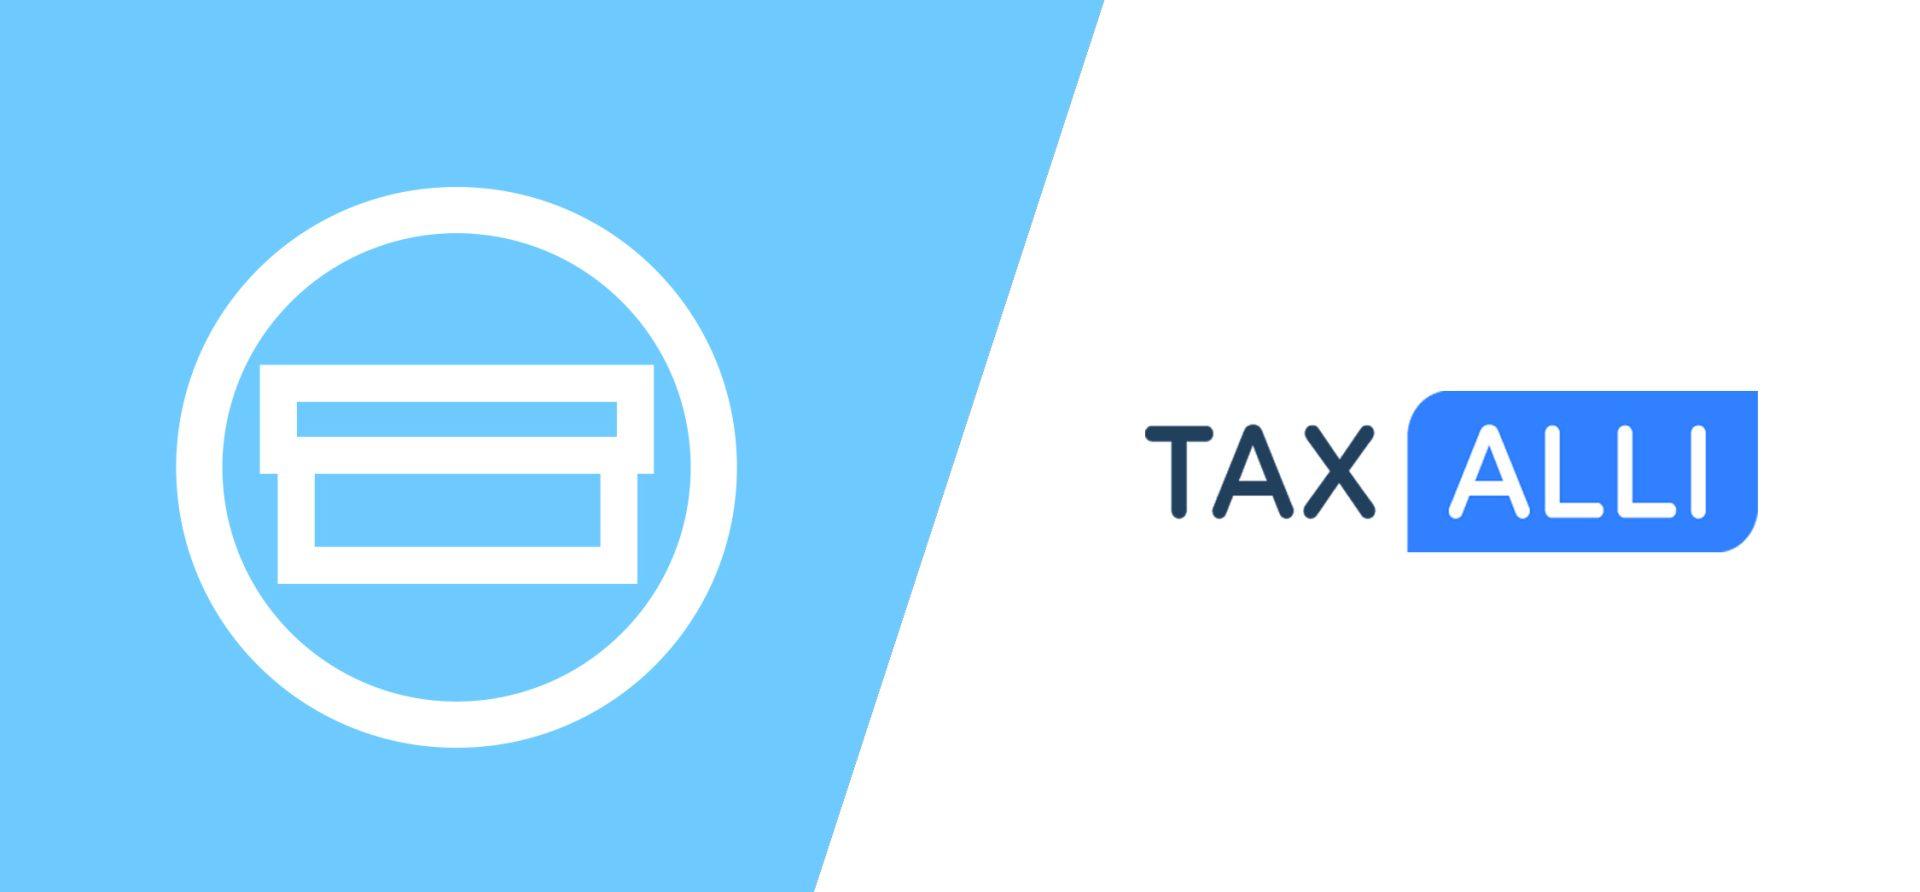 Last minute tax season questions? Ask a pro!